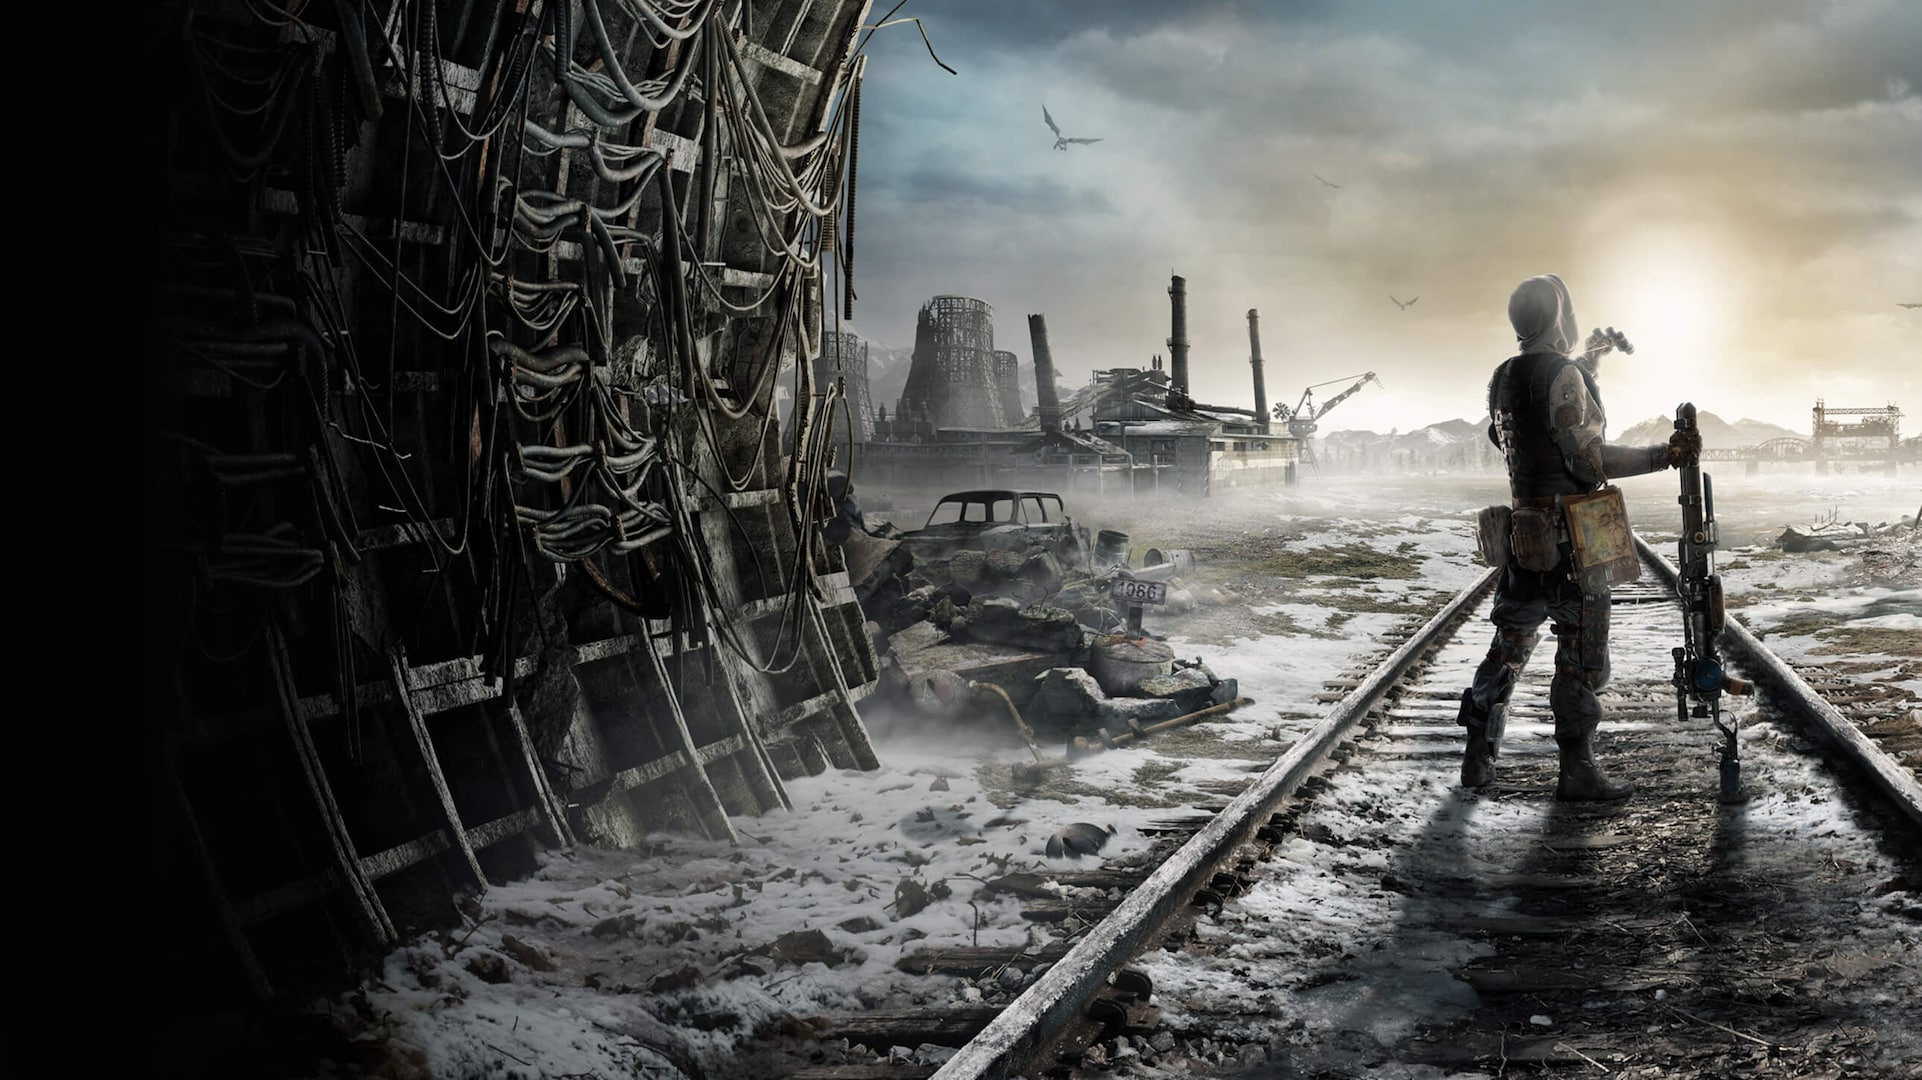 Petyerburgszkoje metro, Szentpétervár, RUS Diesel%2Fproduct%2Fsnapdragon%2Fhome%2Fm3_primary_promo_goldedition-2580x1450-6b738d723995d4967b348c1ffe4d6f8e9ea68512